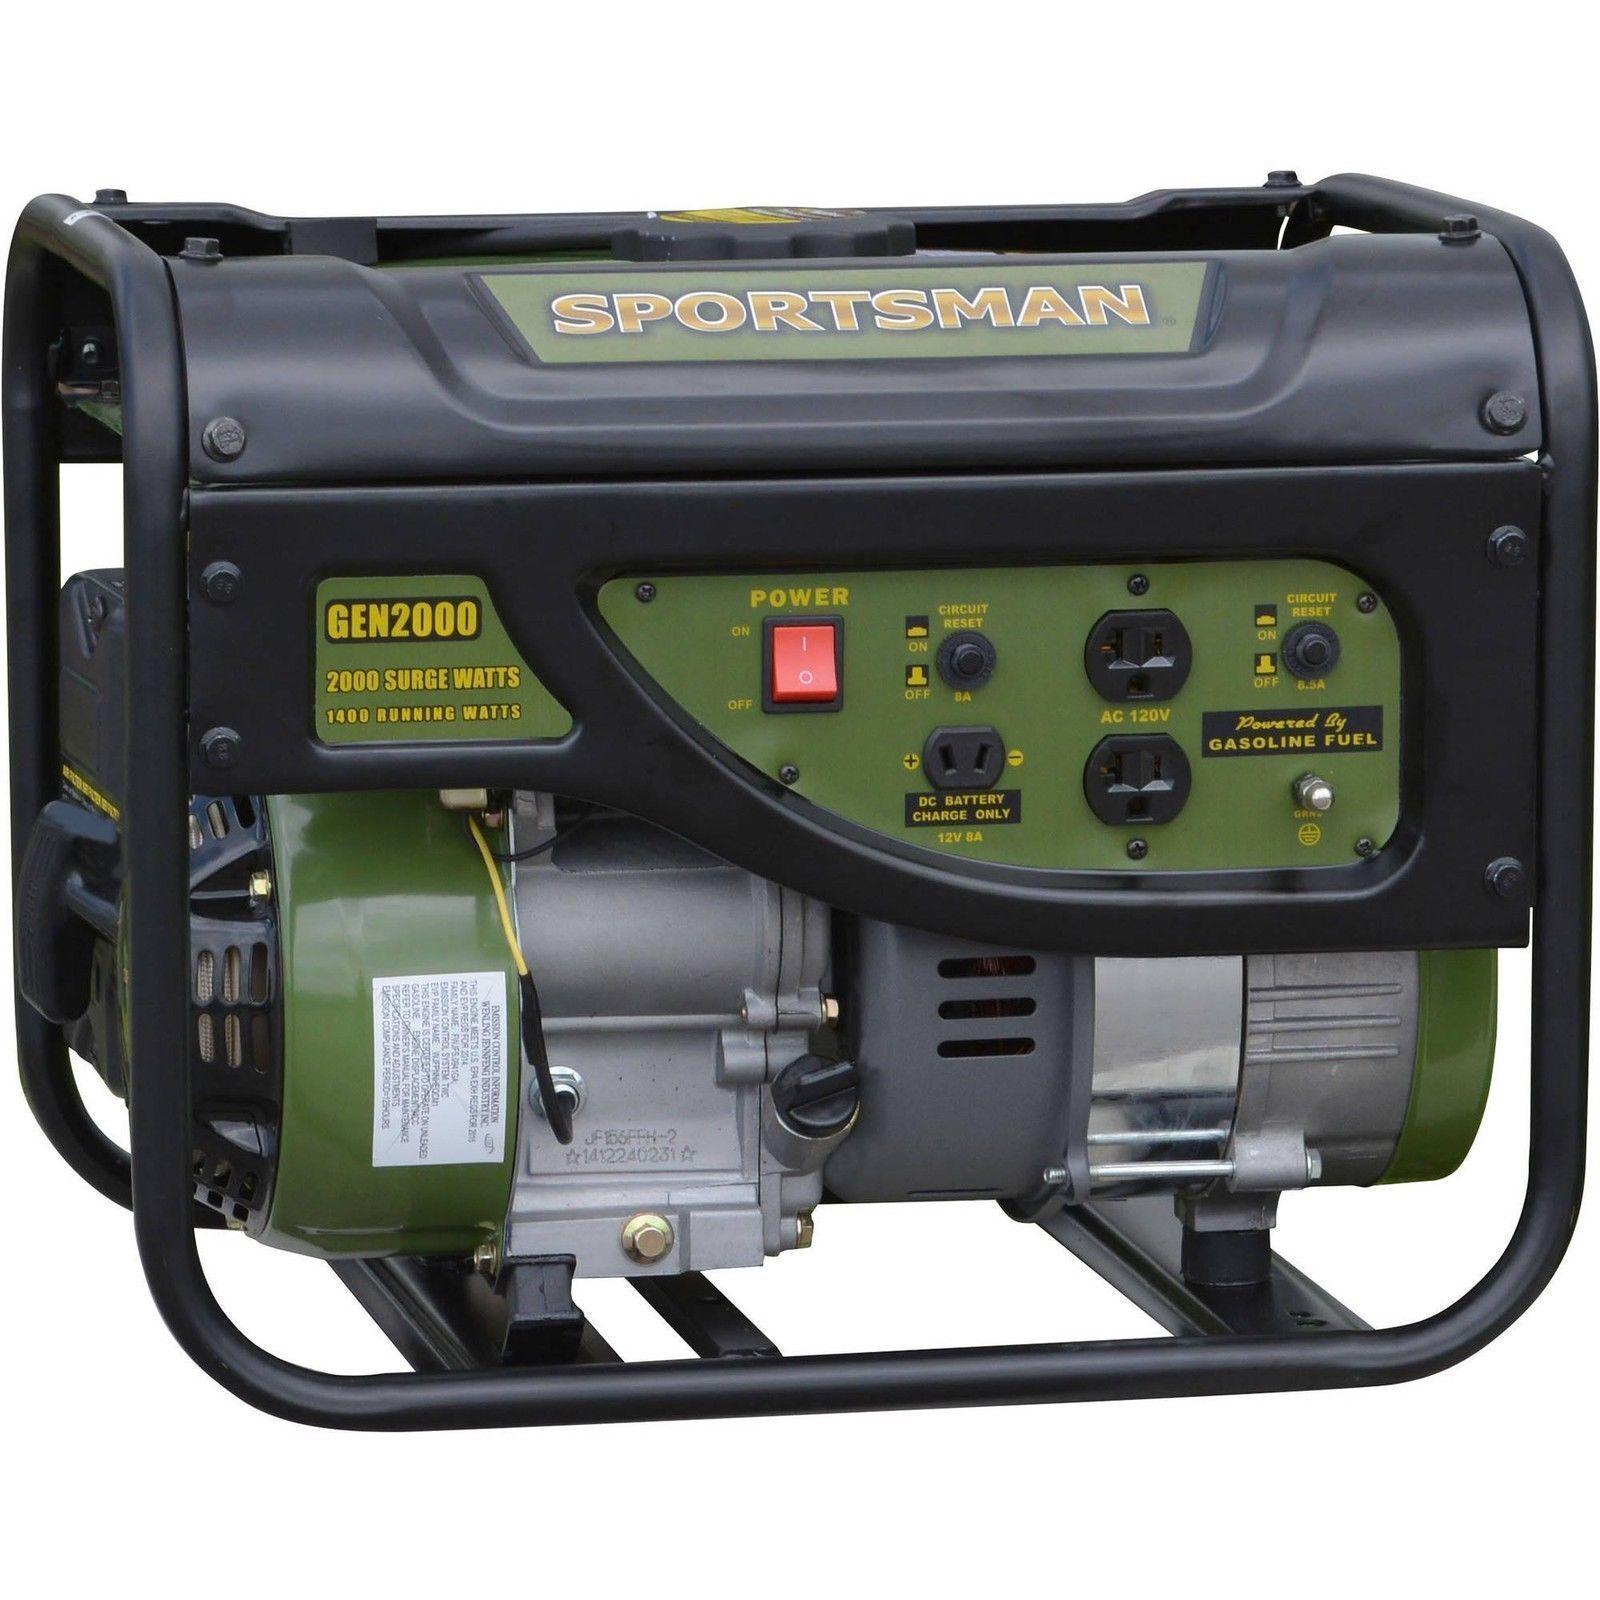 Sportsman GEN2000 Portable Gasoline Generator